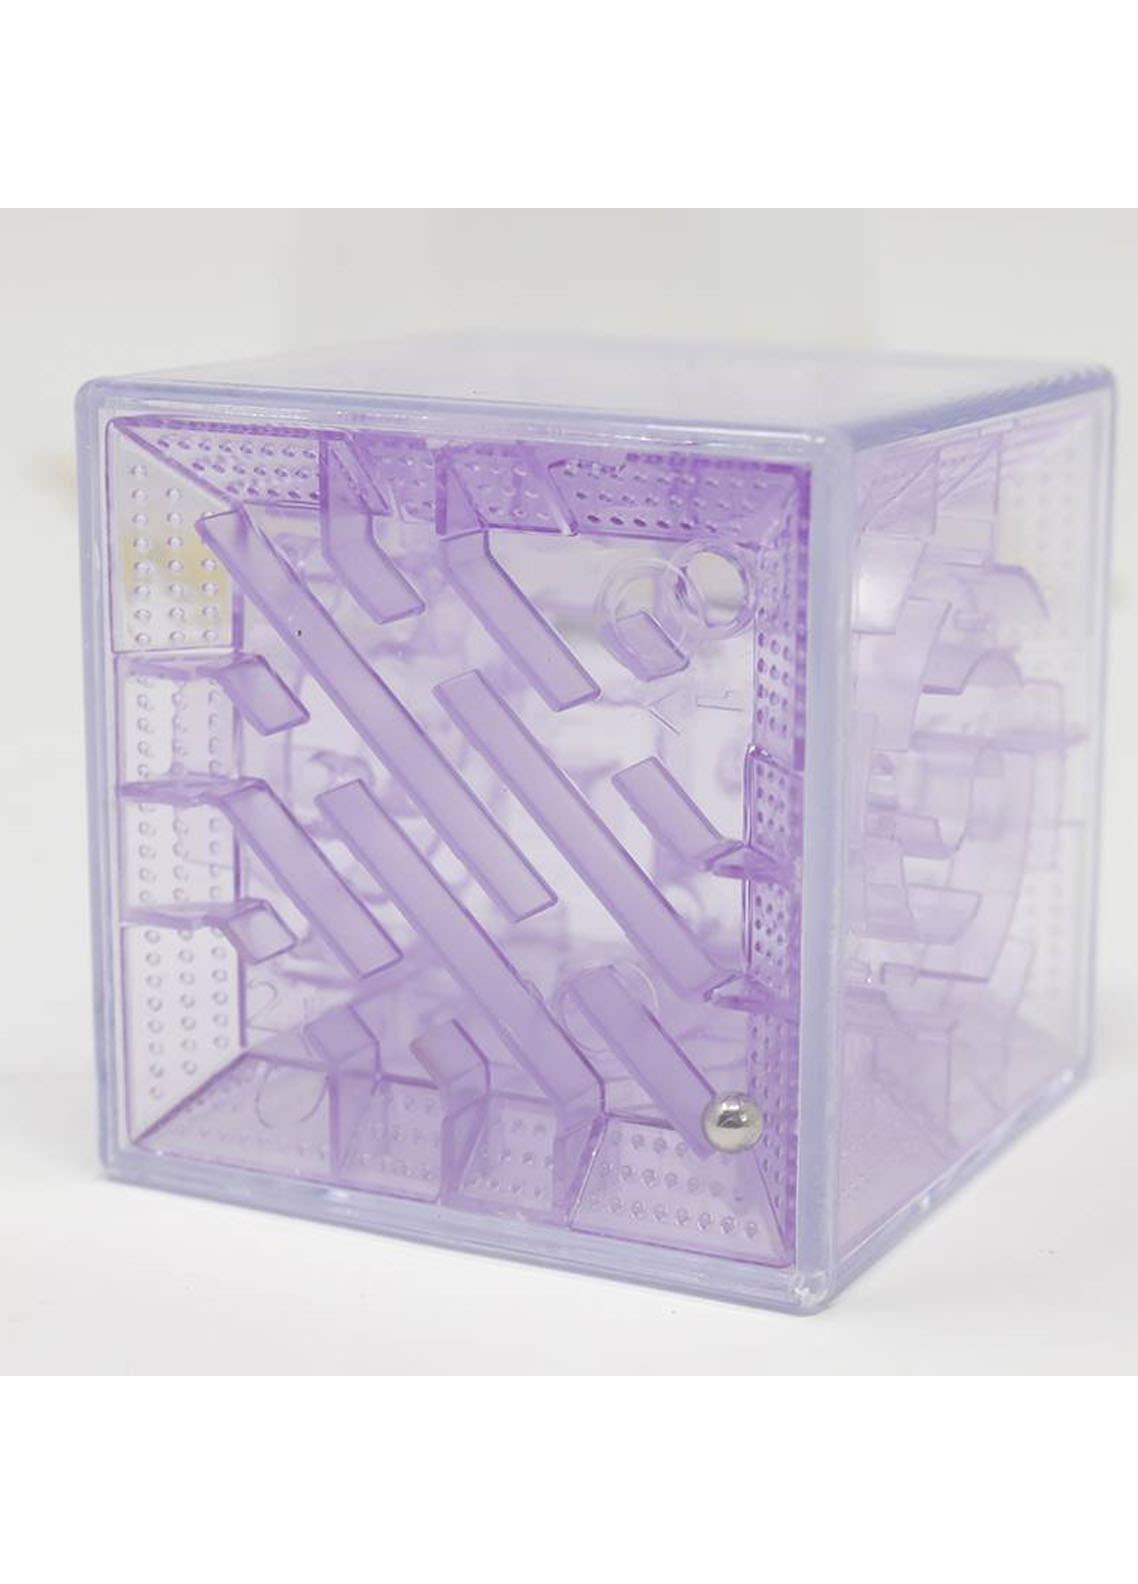 Mumuso TRANSPARENT 3D MAZE(PURPLE-5.5 CM)-Purple